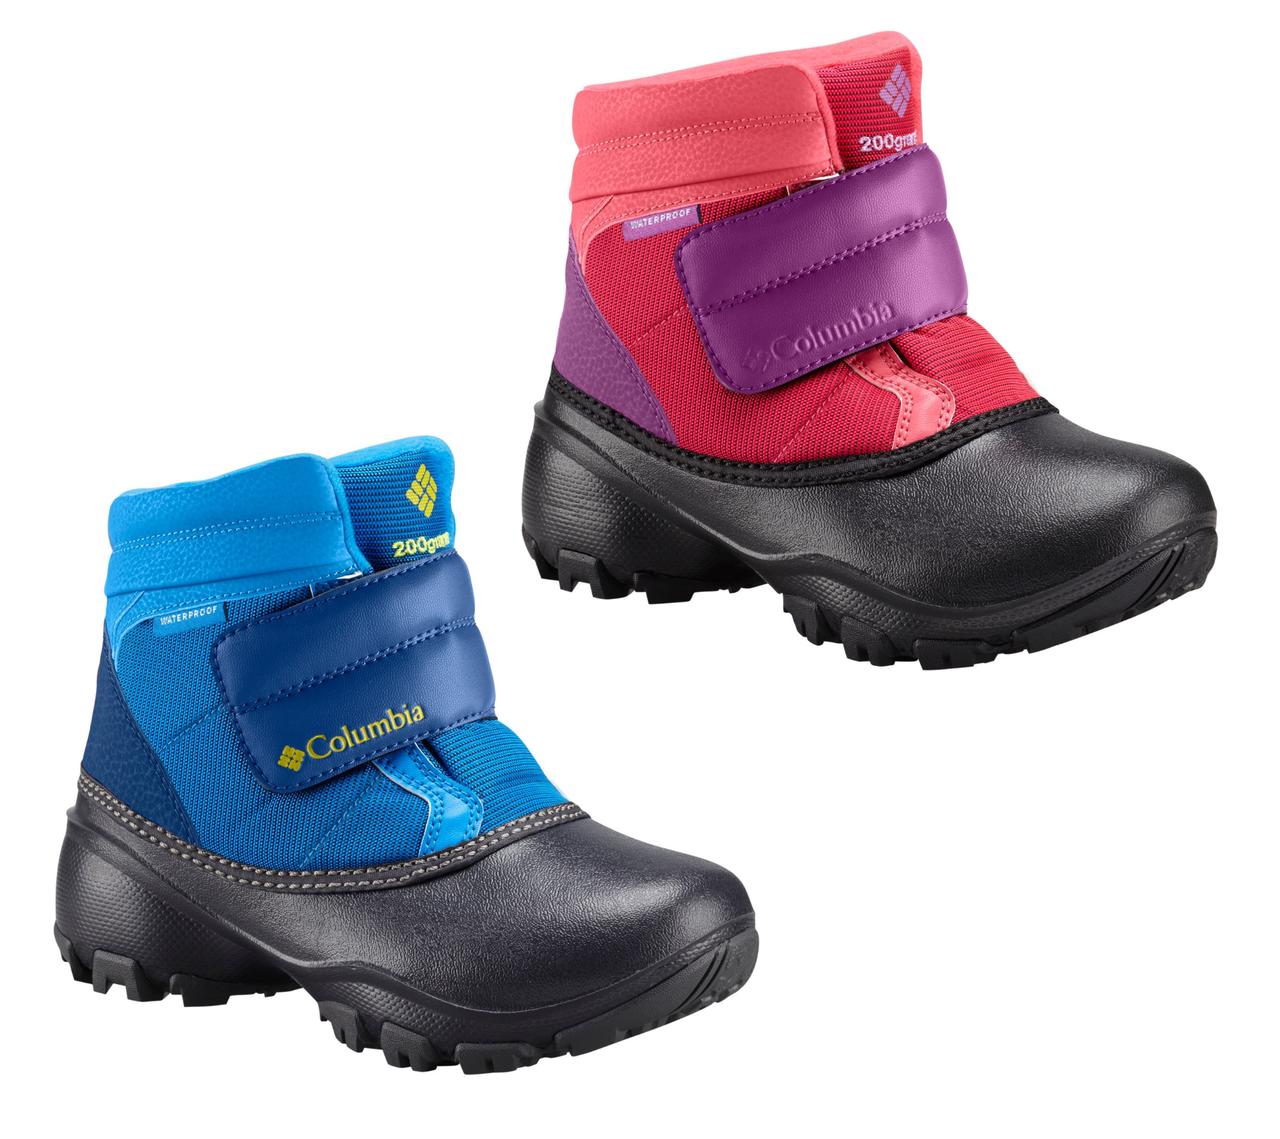 Ботинки зимние детские Columbia Kids Rope Tow Kruser сапоги непромокаемые 0b3efac333fdc